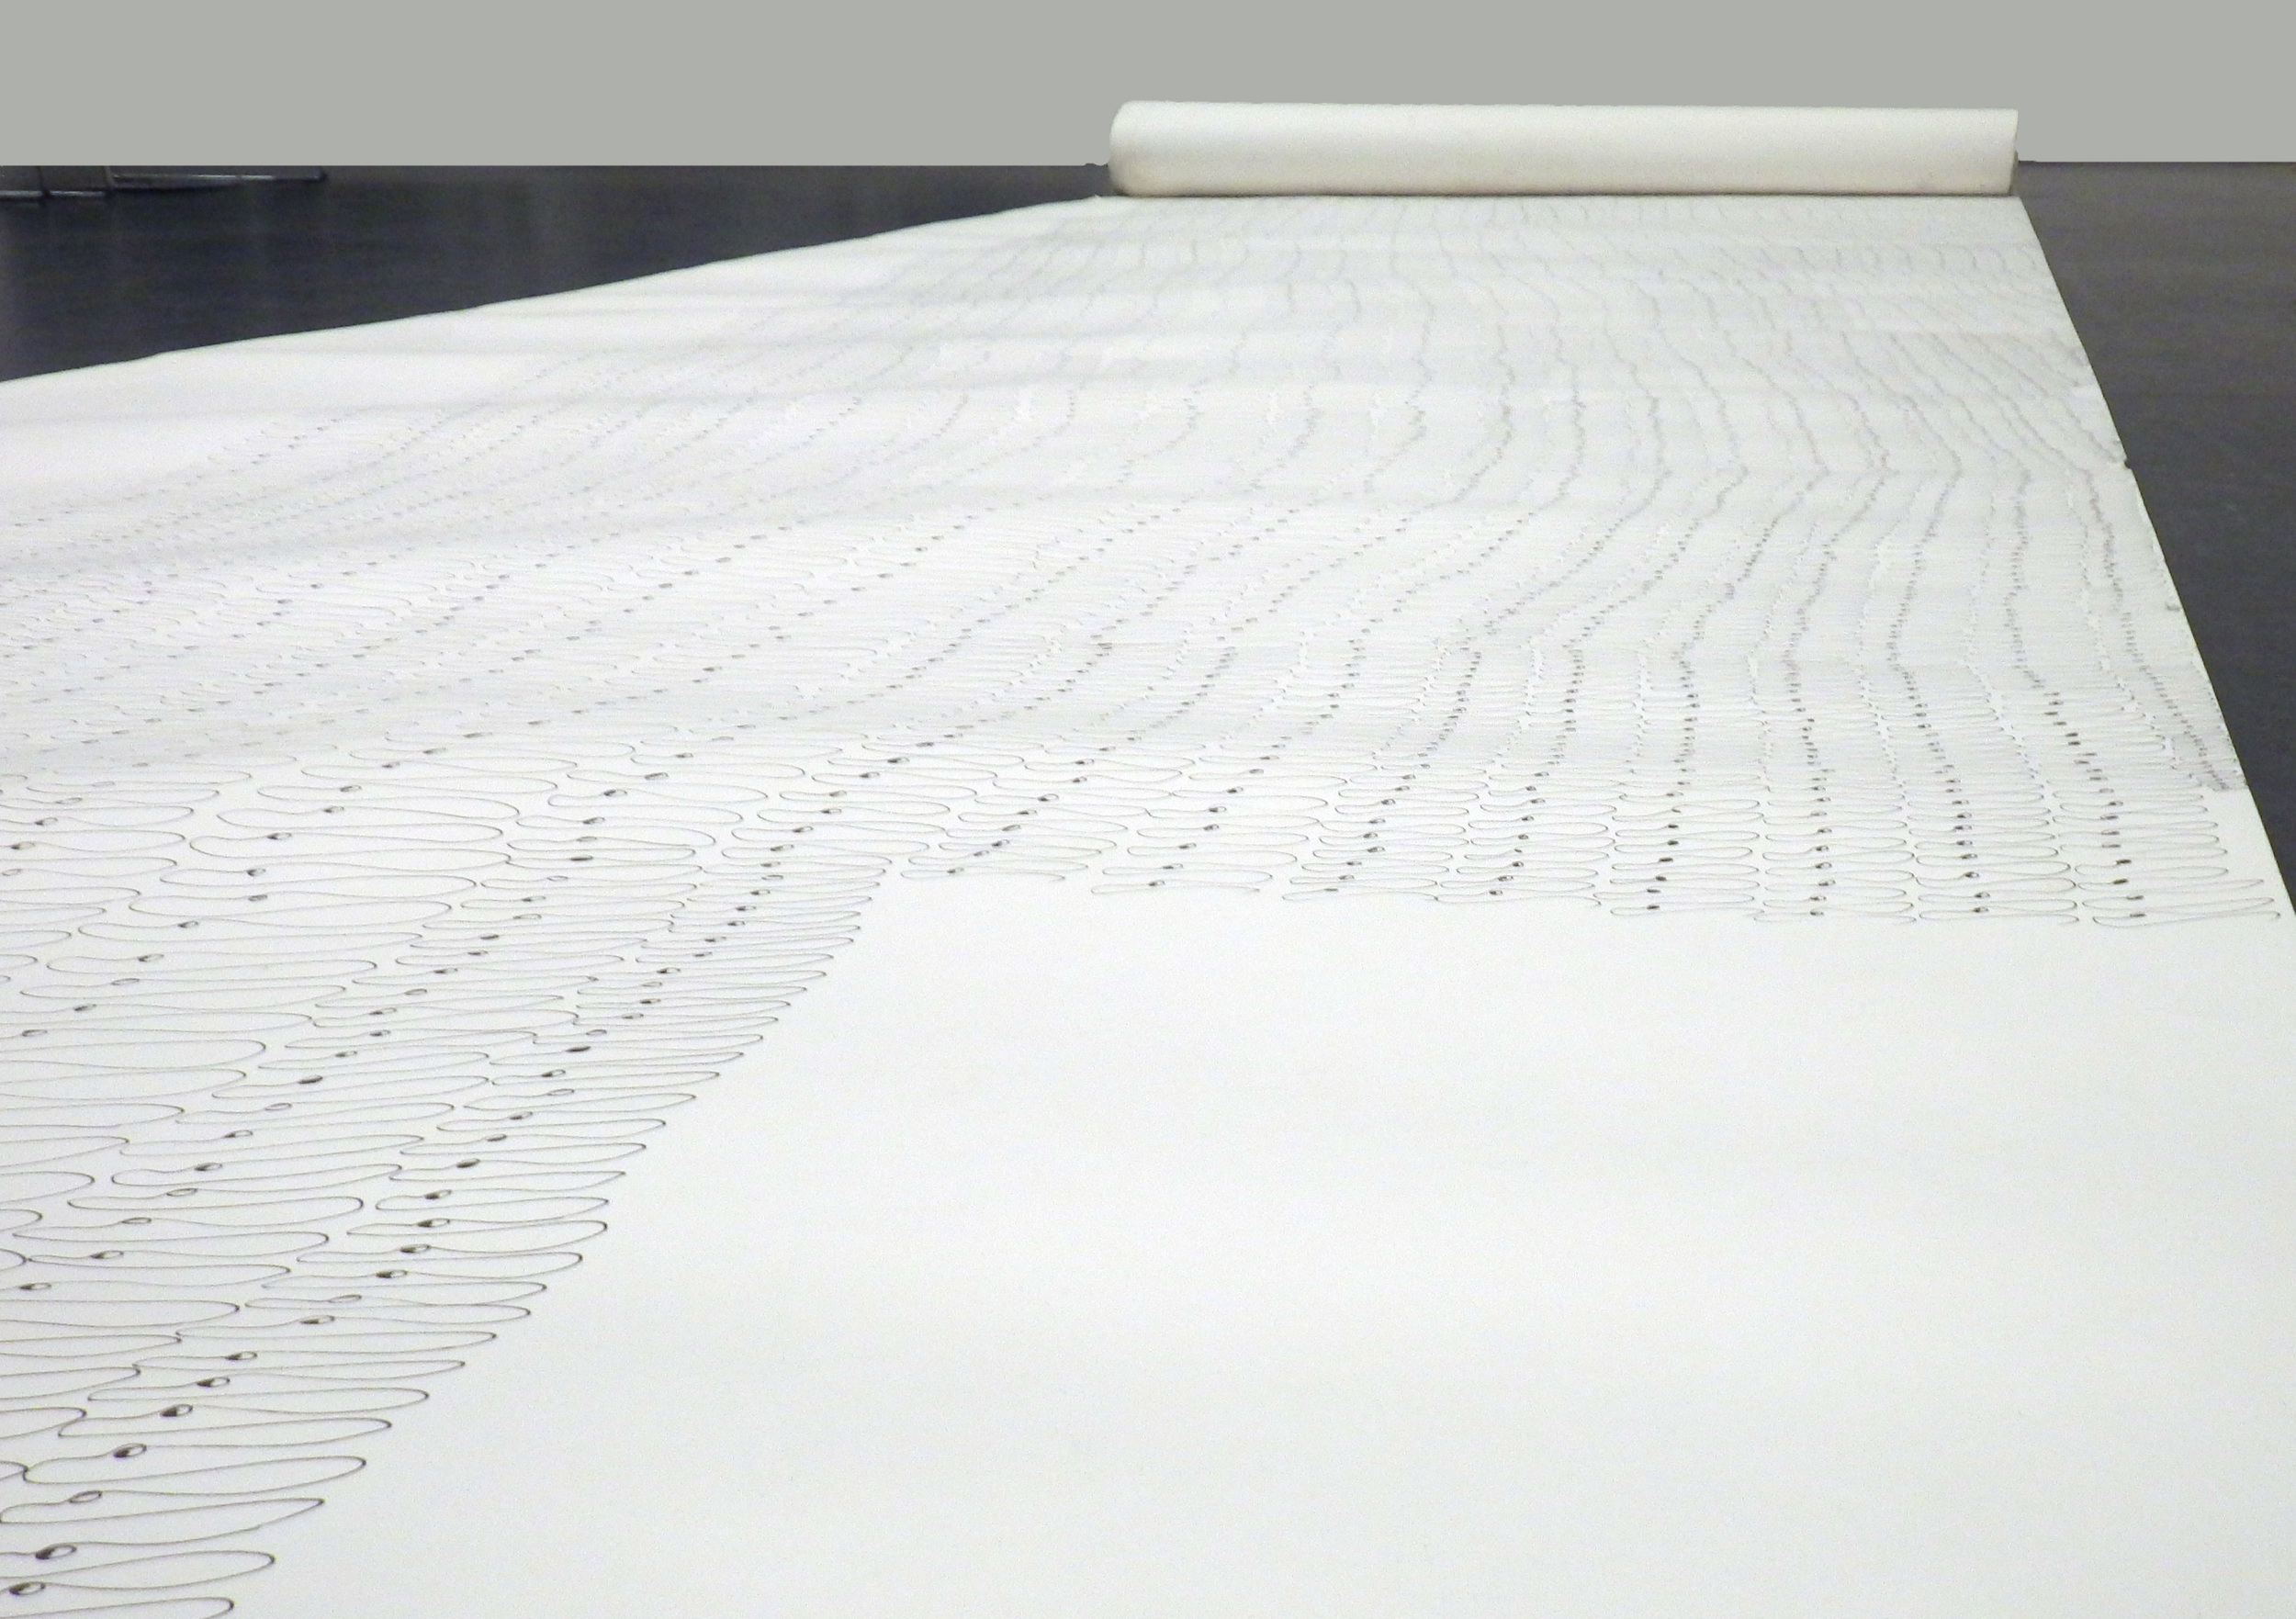 Unveiling the Va, 2014, Black Pen on Paper, 4.4x 12 feet